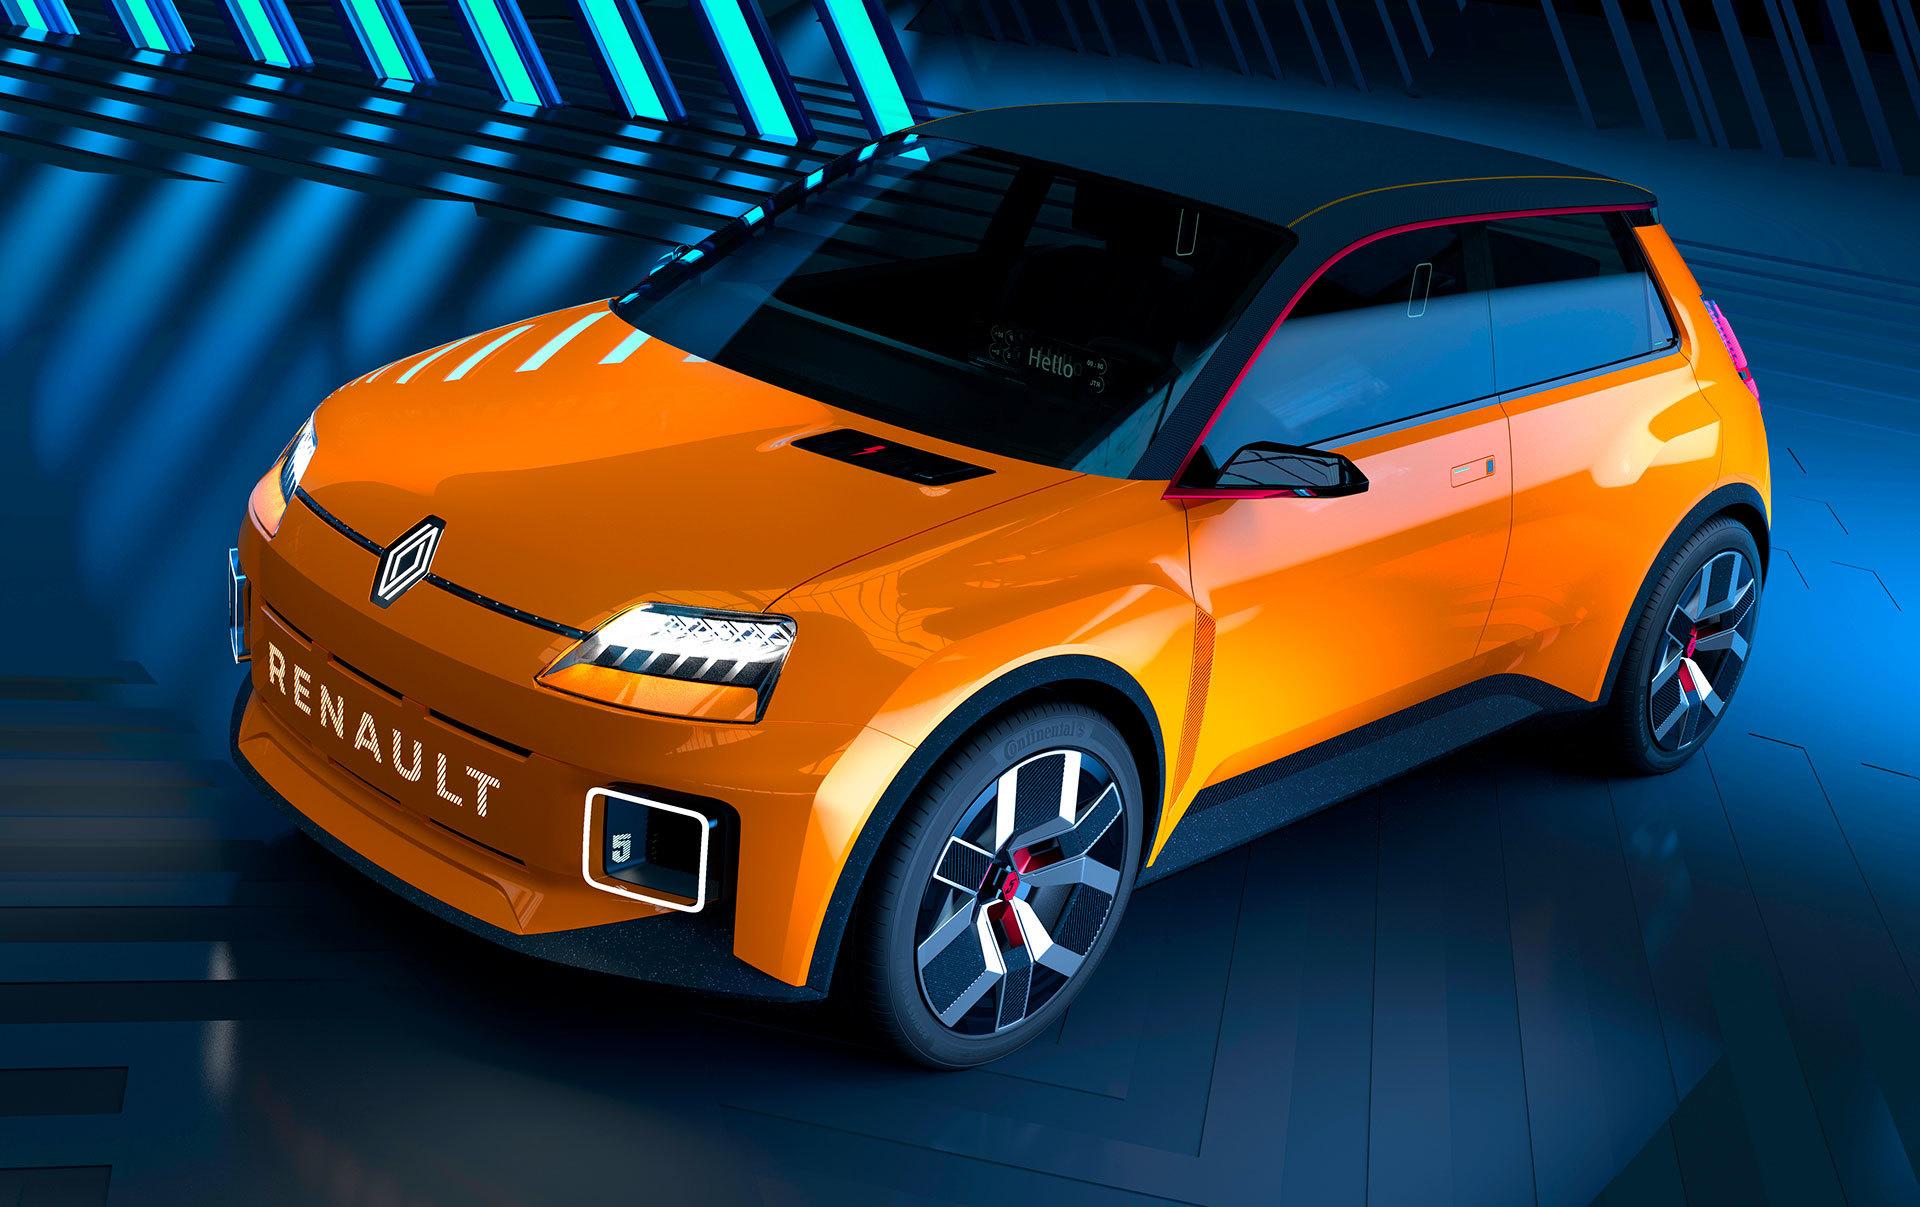 Nuevo Renault 5 Naranja Photoshop Frontal